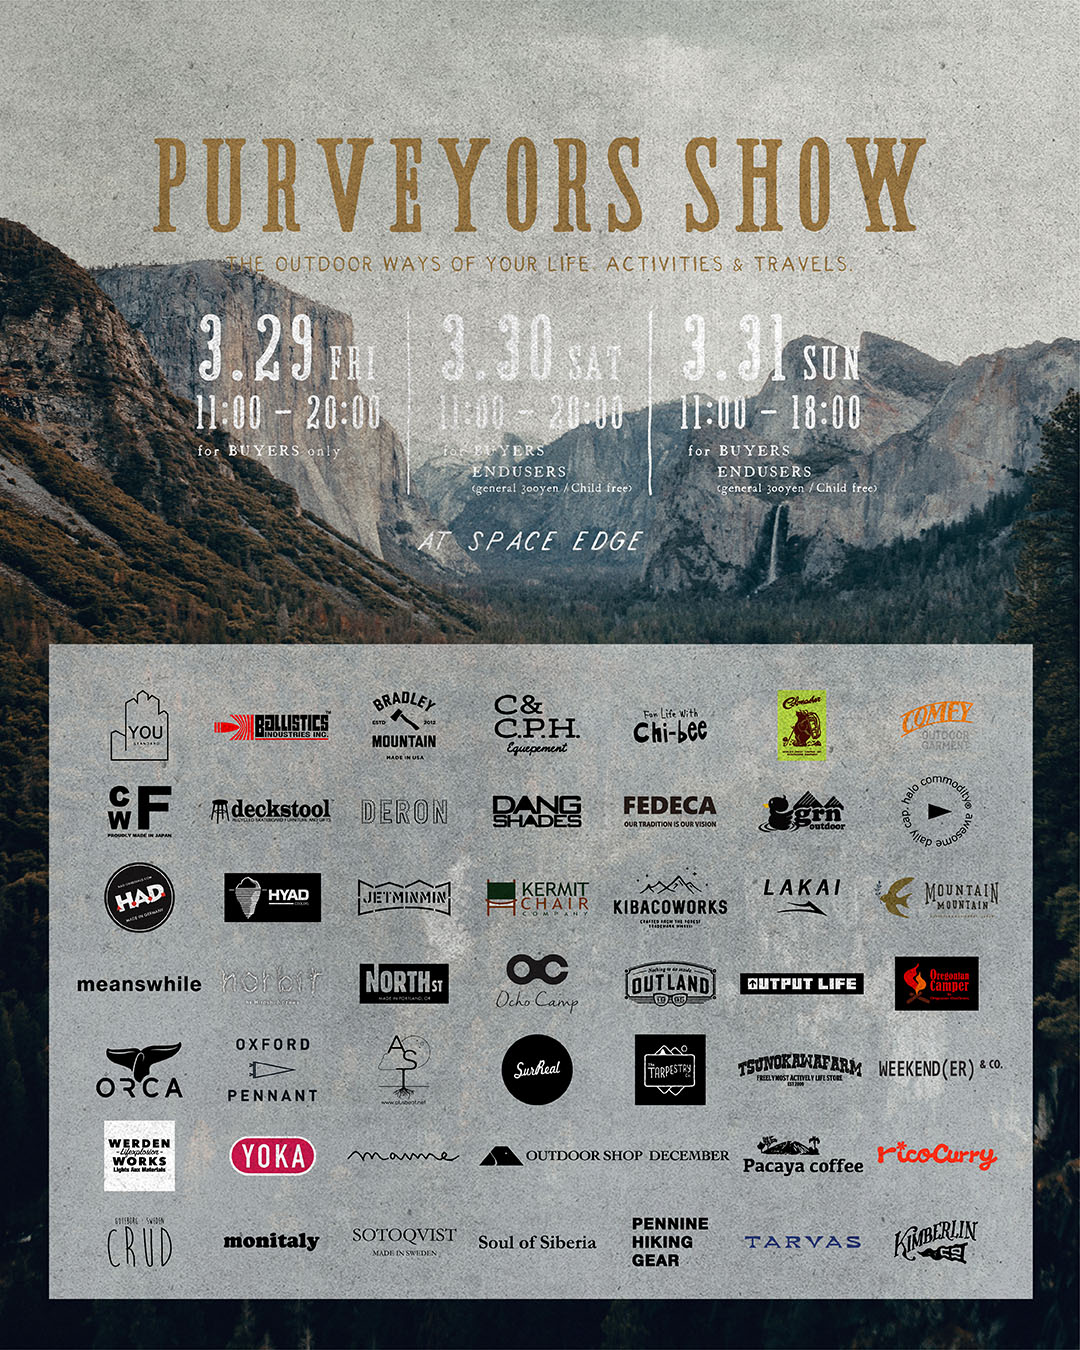 Purveyors Show2019春